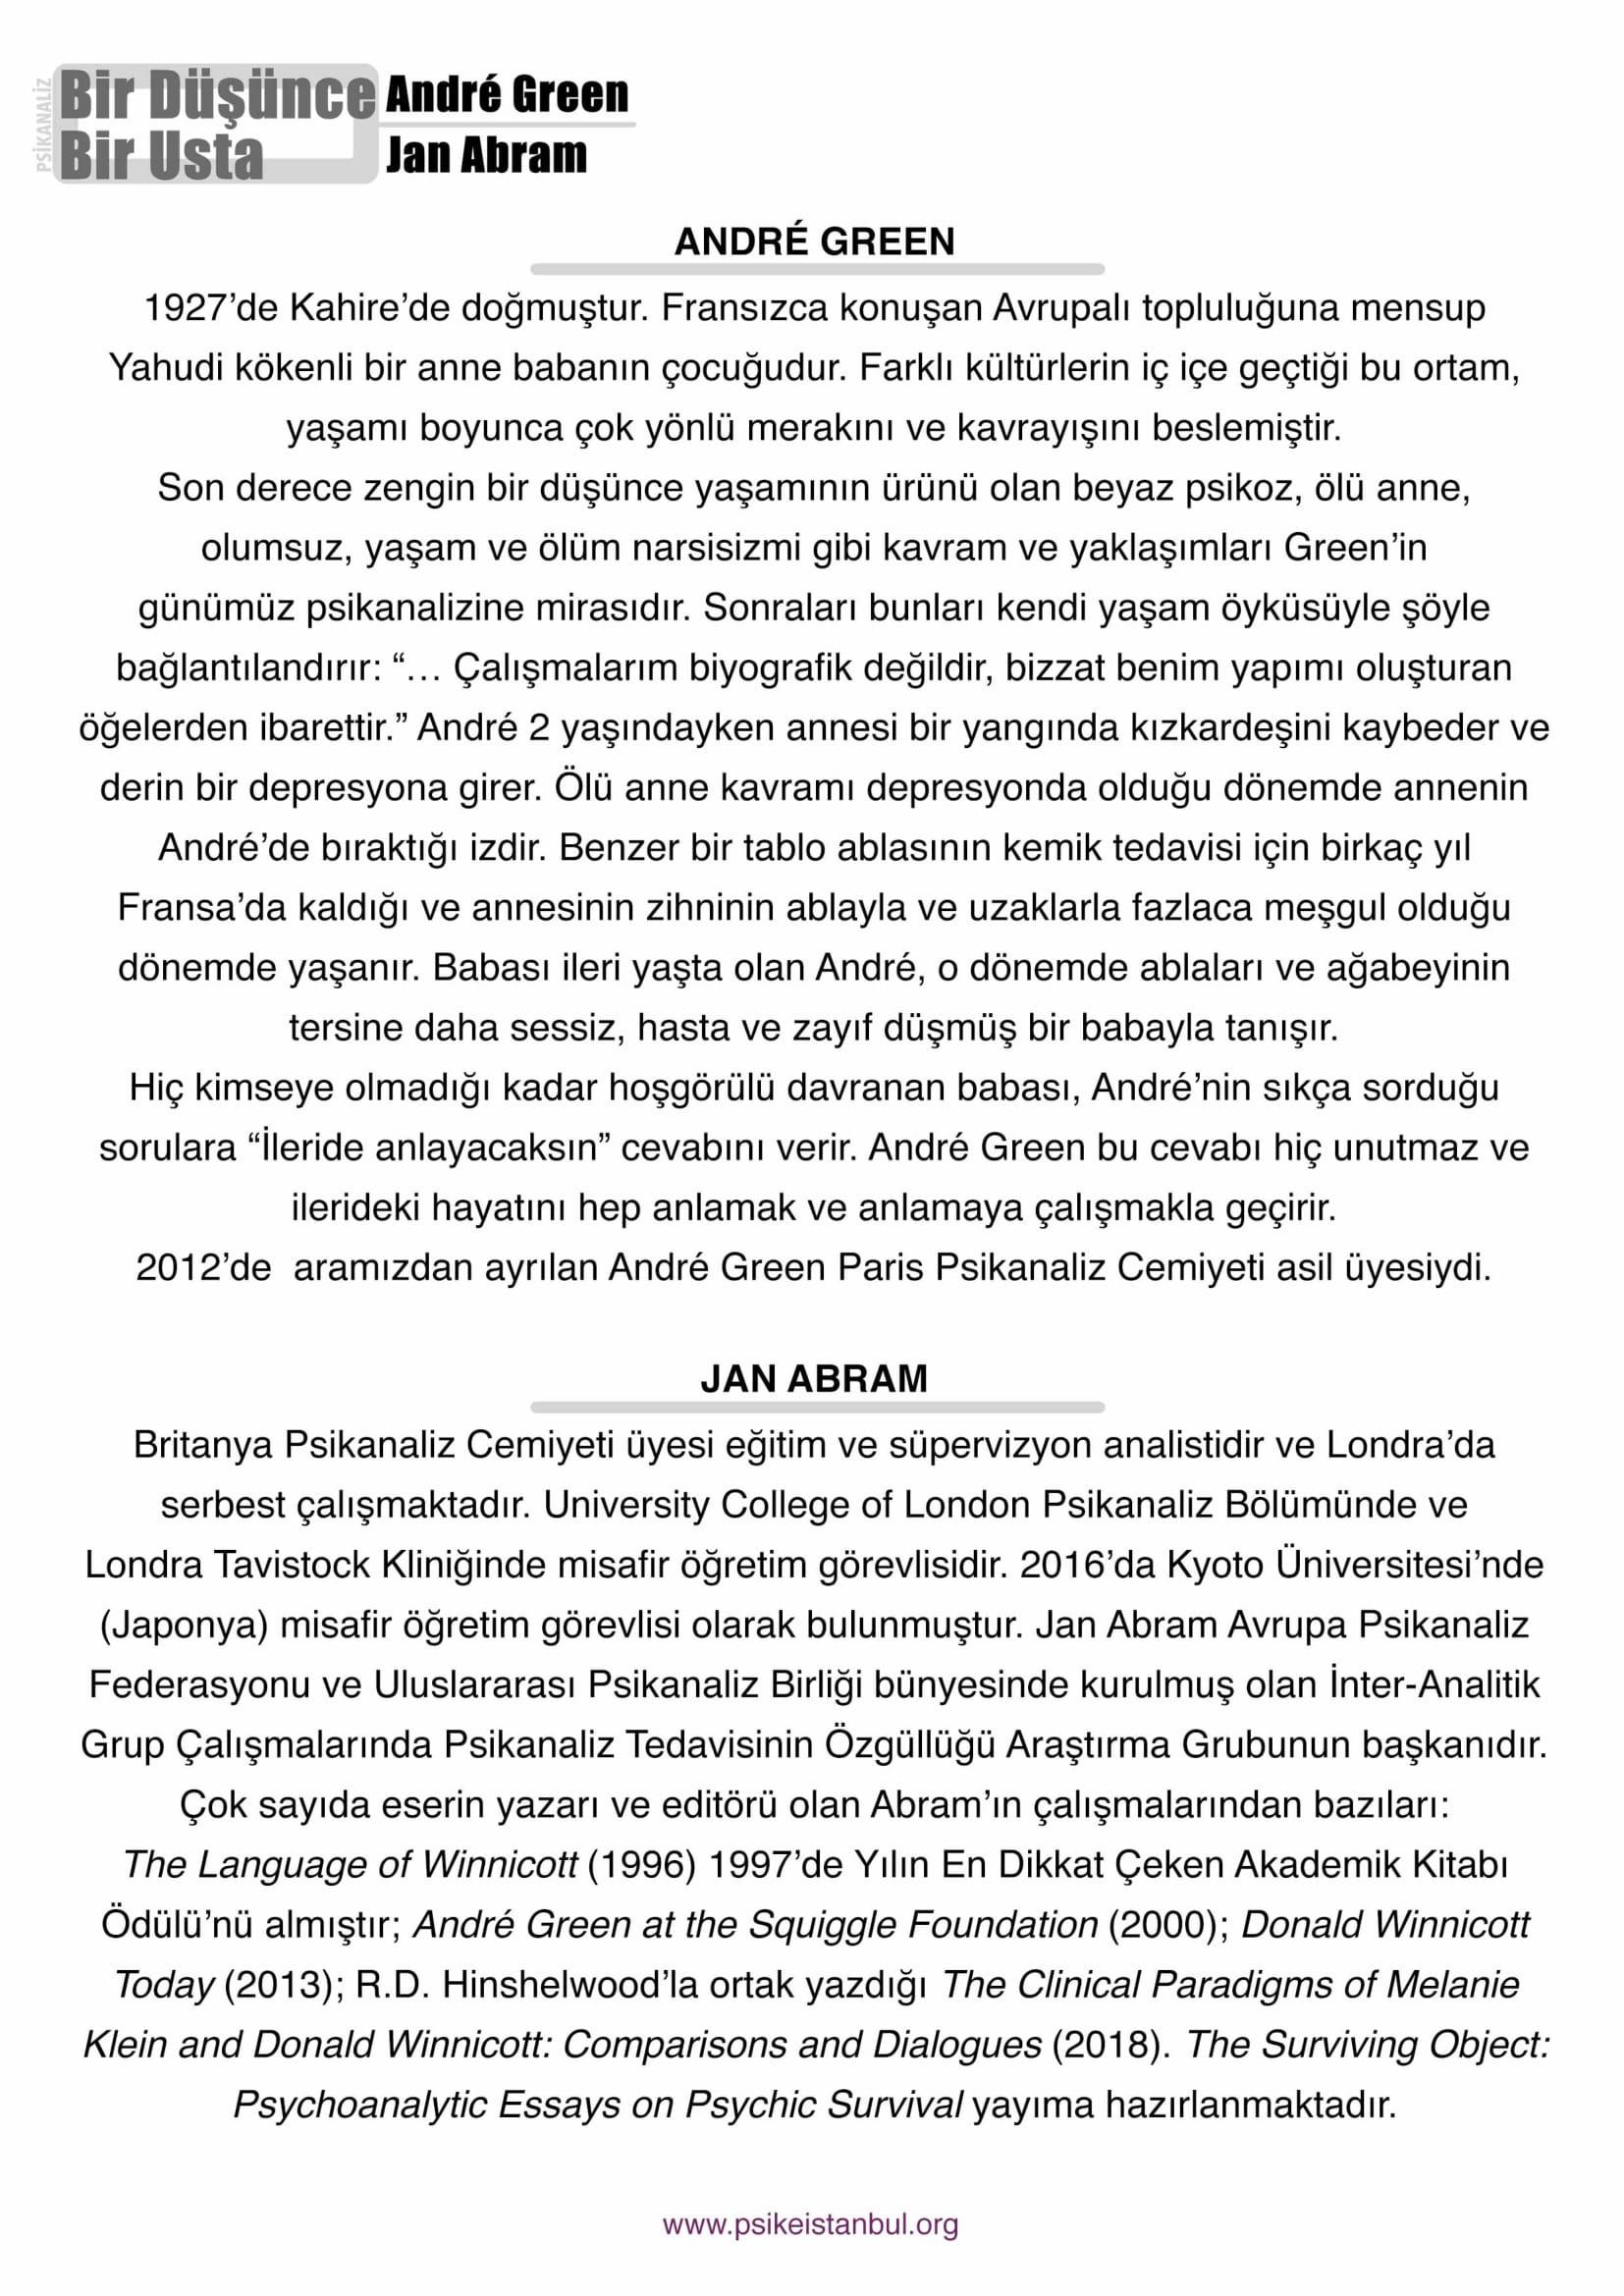 janabram_duyuru_rev-3